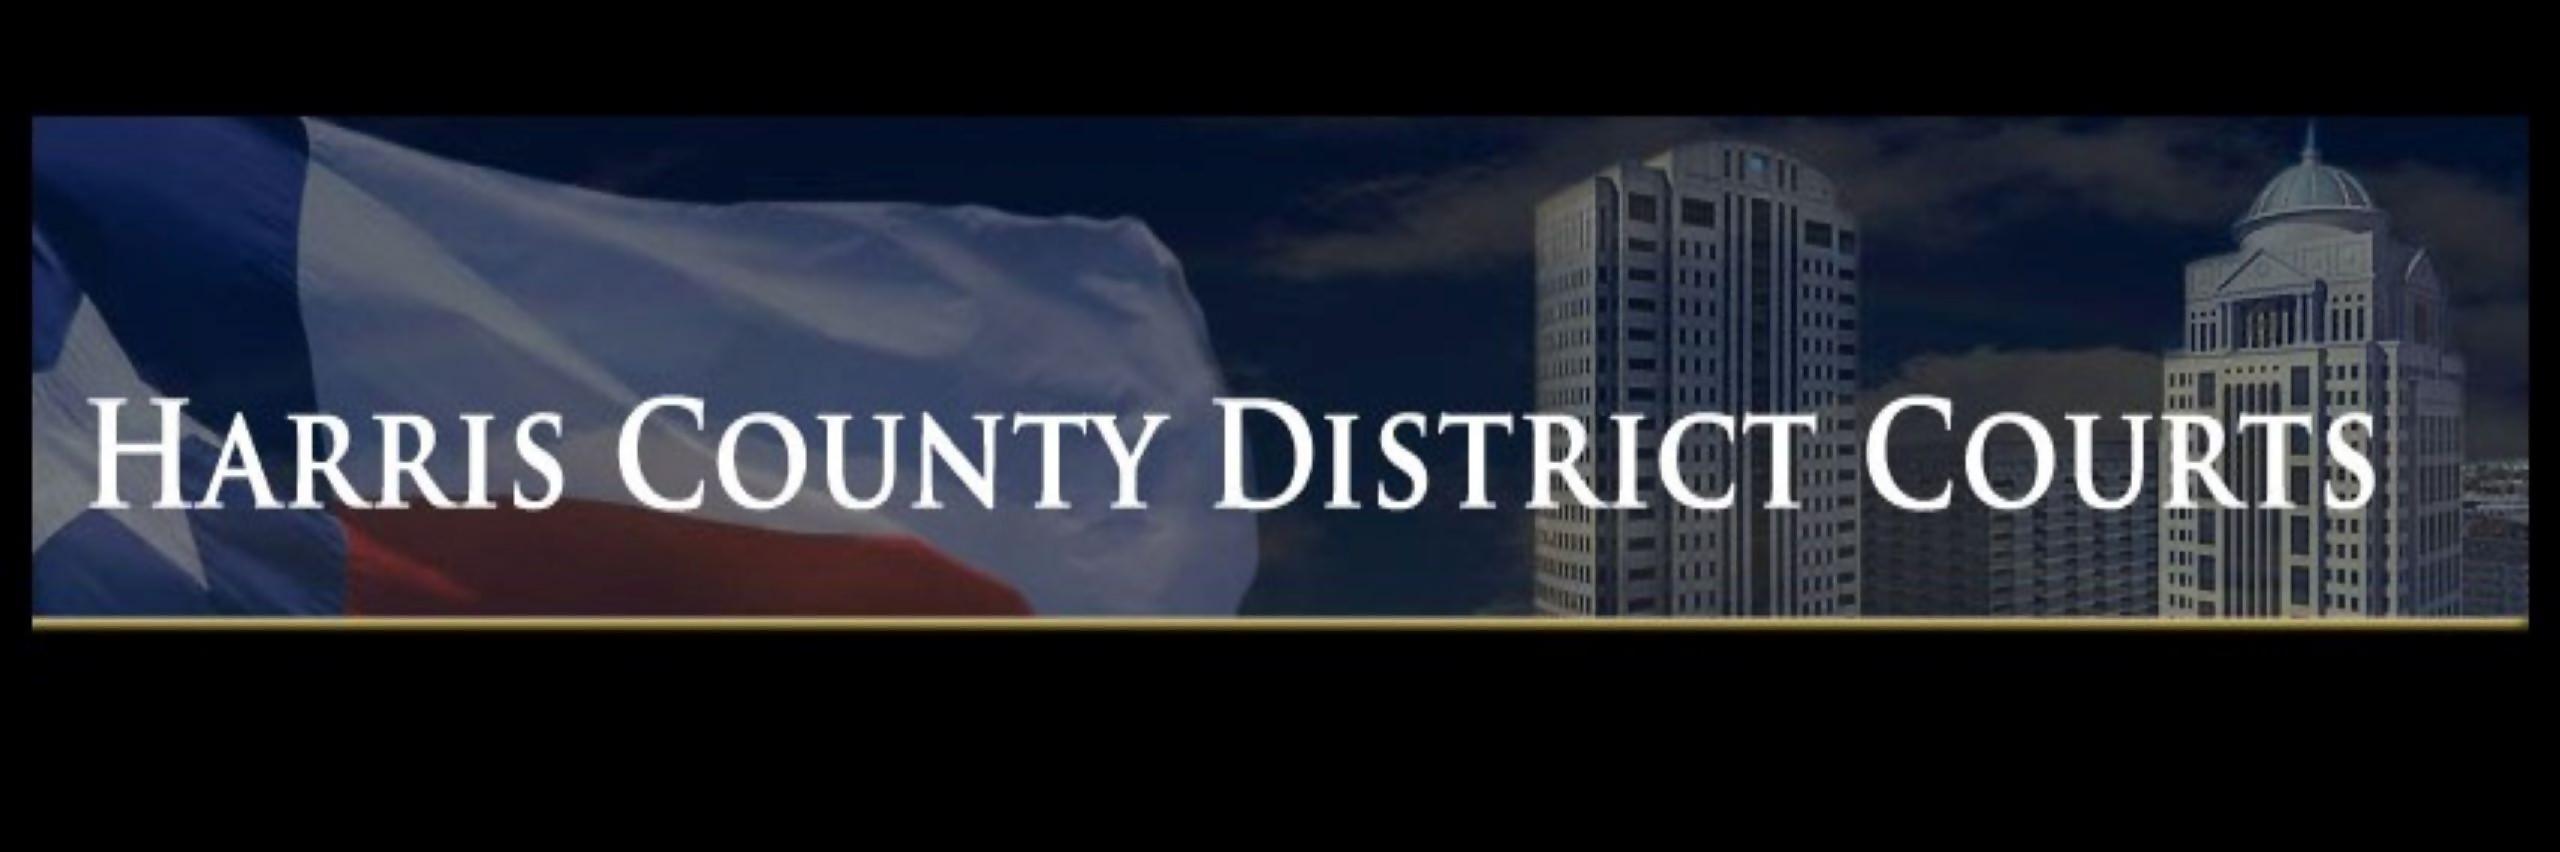 127th District Court - Live Stream